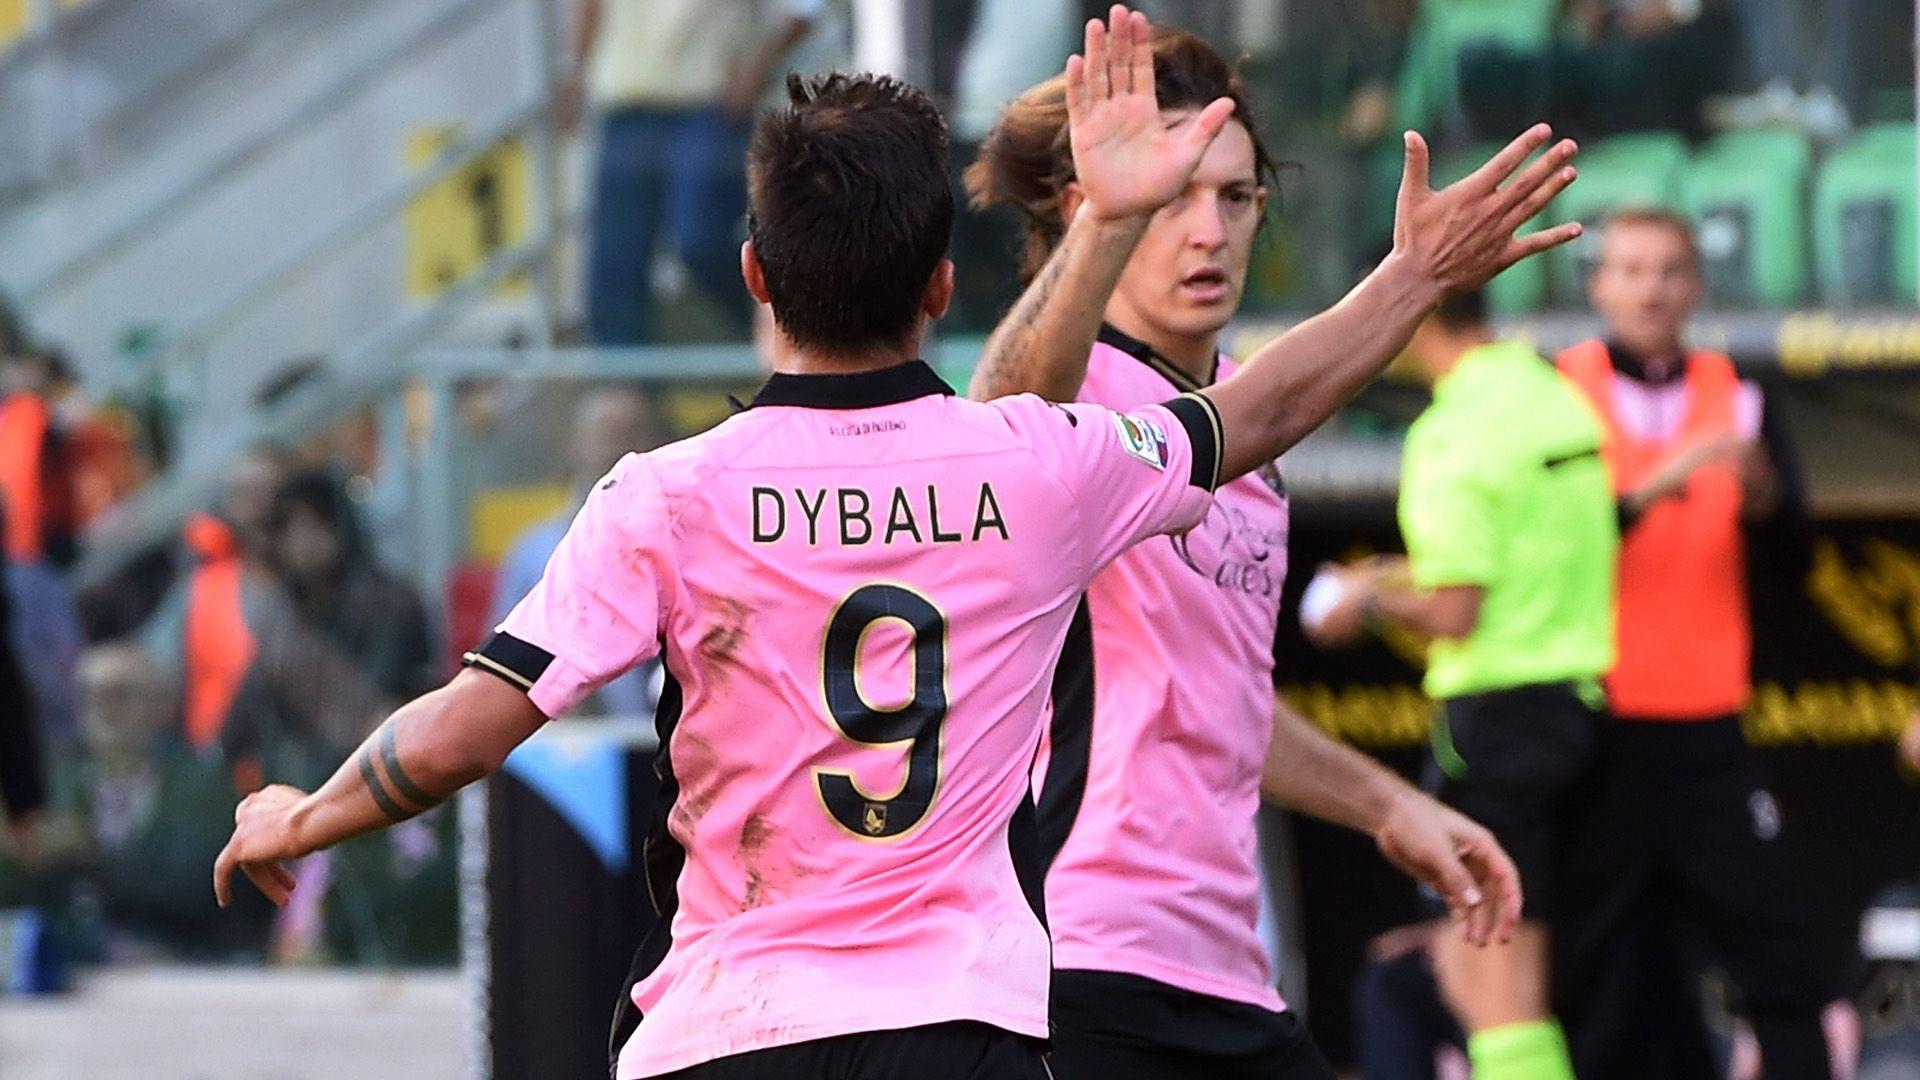 Dybala HD Wallpapers, Football Backgrounds